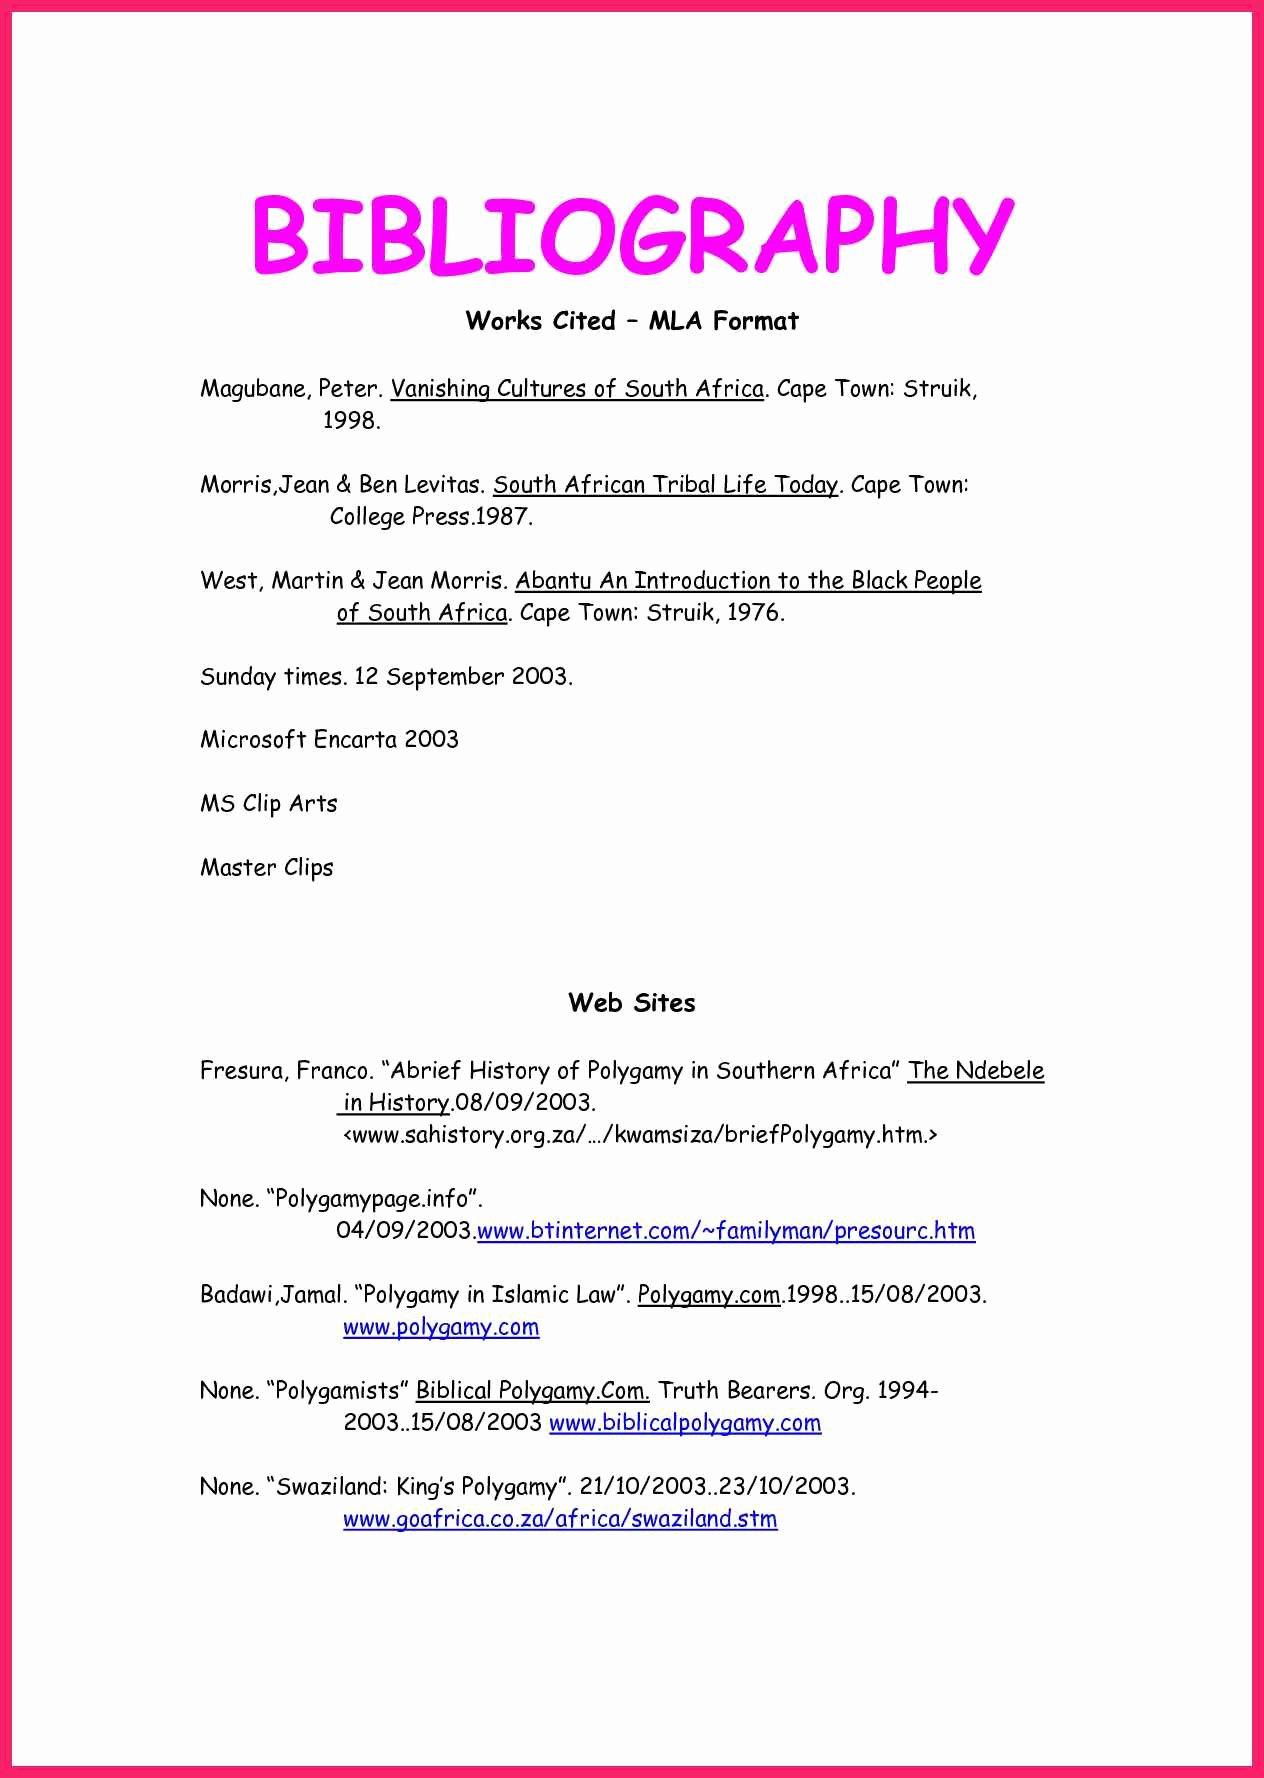 Letter In Mla format Elegant Bibliography In Mla format